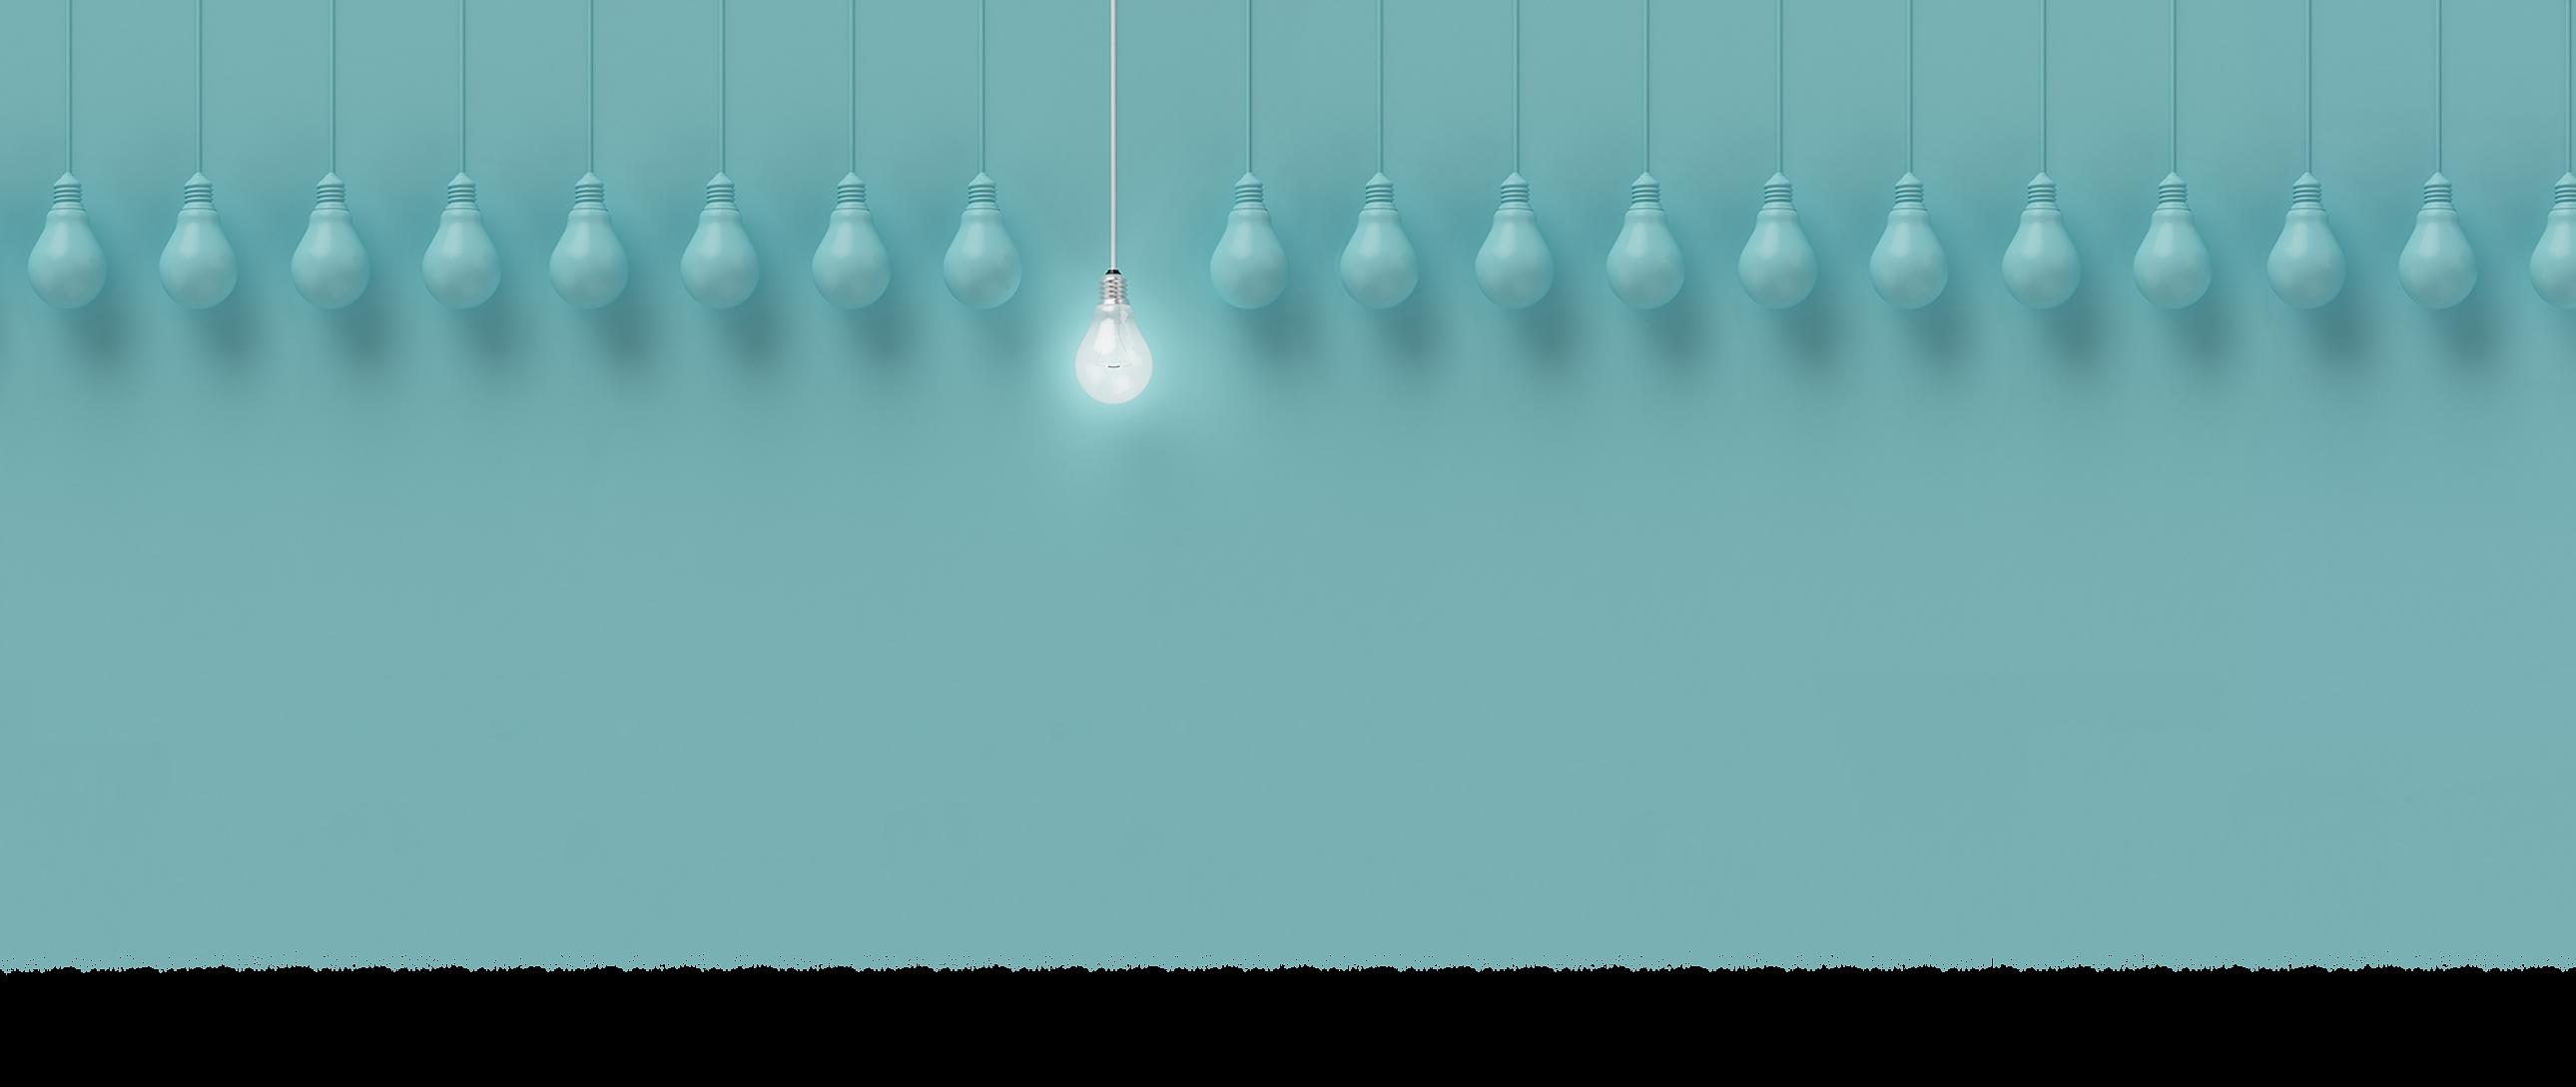 lightbulbs_wix_shutterstock_150dpi_47308